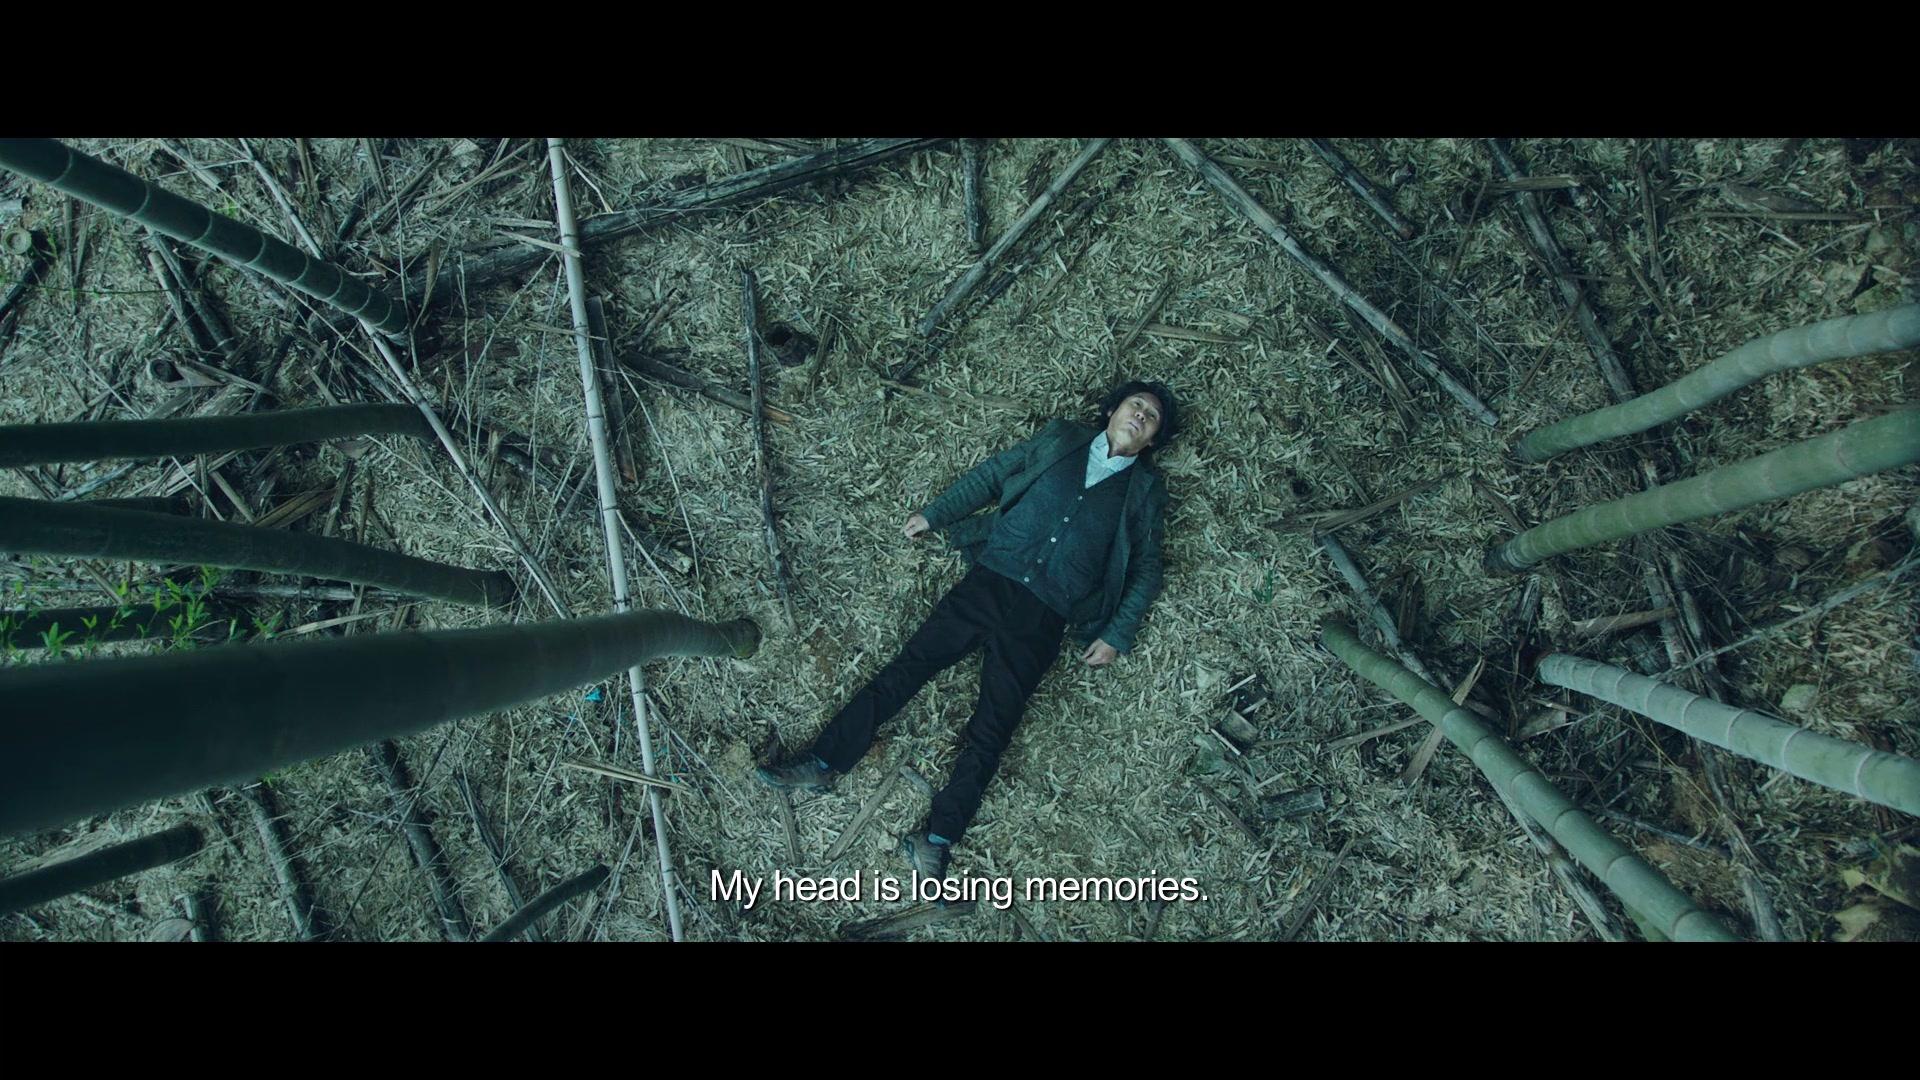 Trailer: Memoir of a Murderer